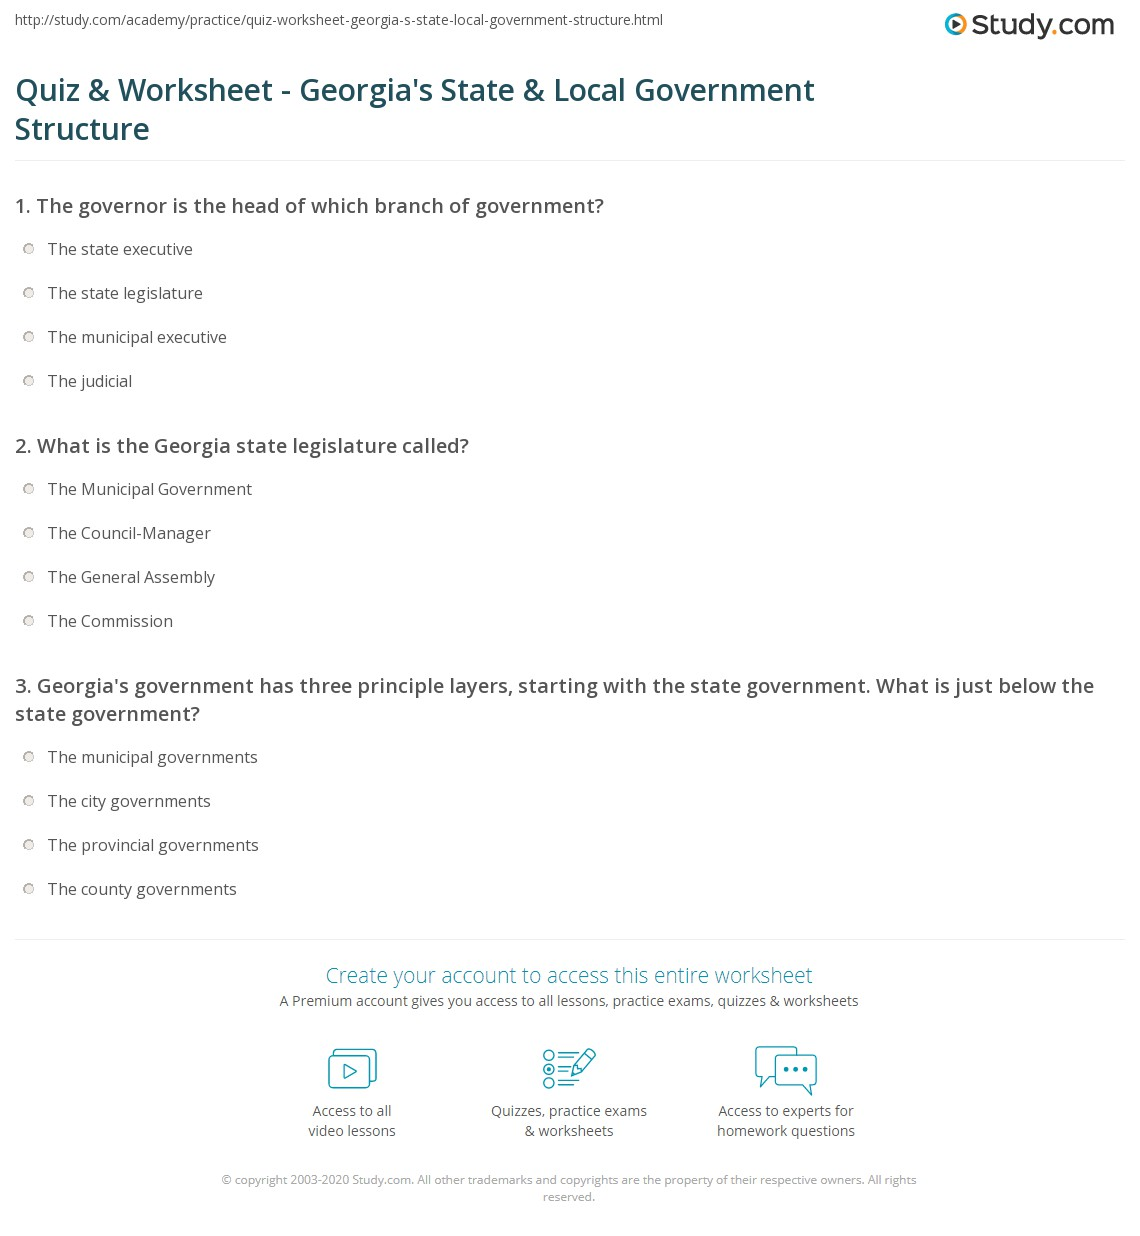 Quiz worksheet georgias state local government structure print state local government structure in georgia worksheet xflitez Gallery